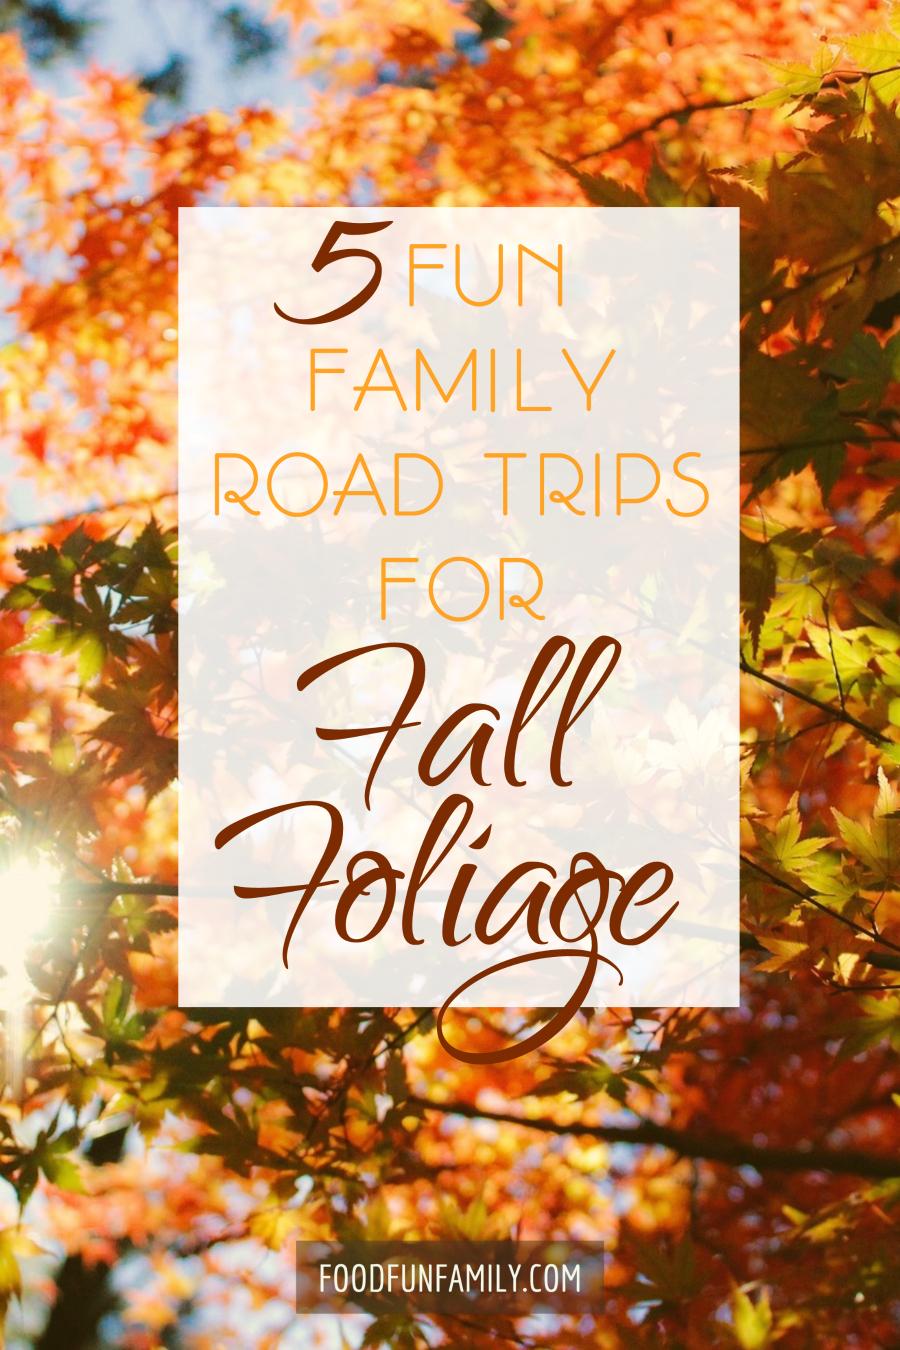 5 Fun Family Road Trips for Fall Foliage